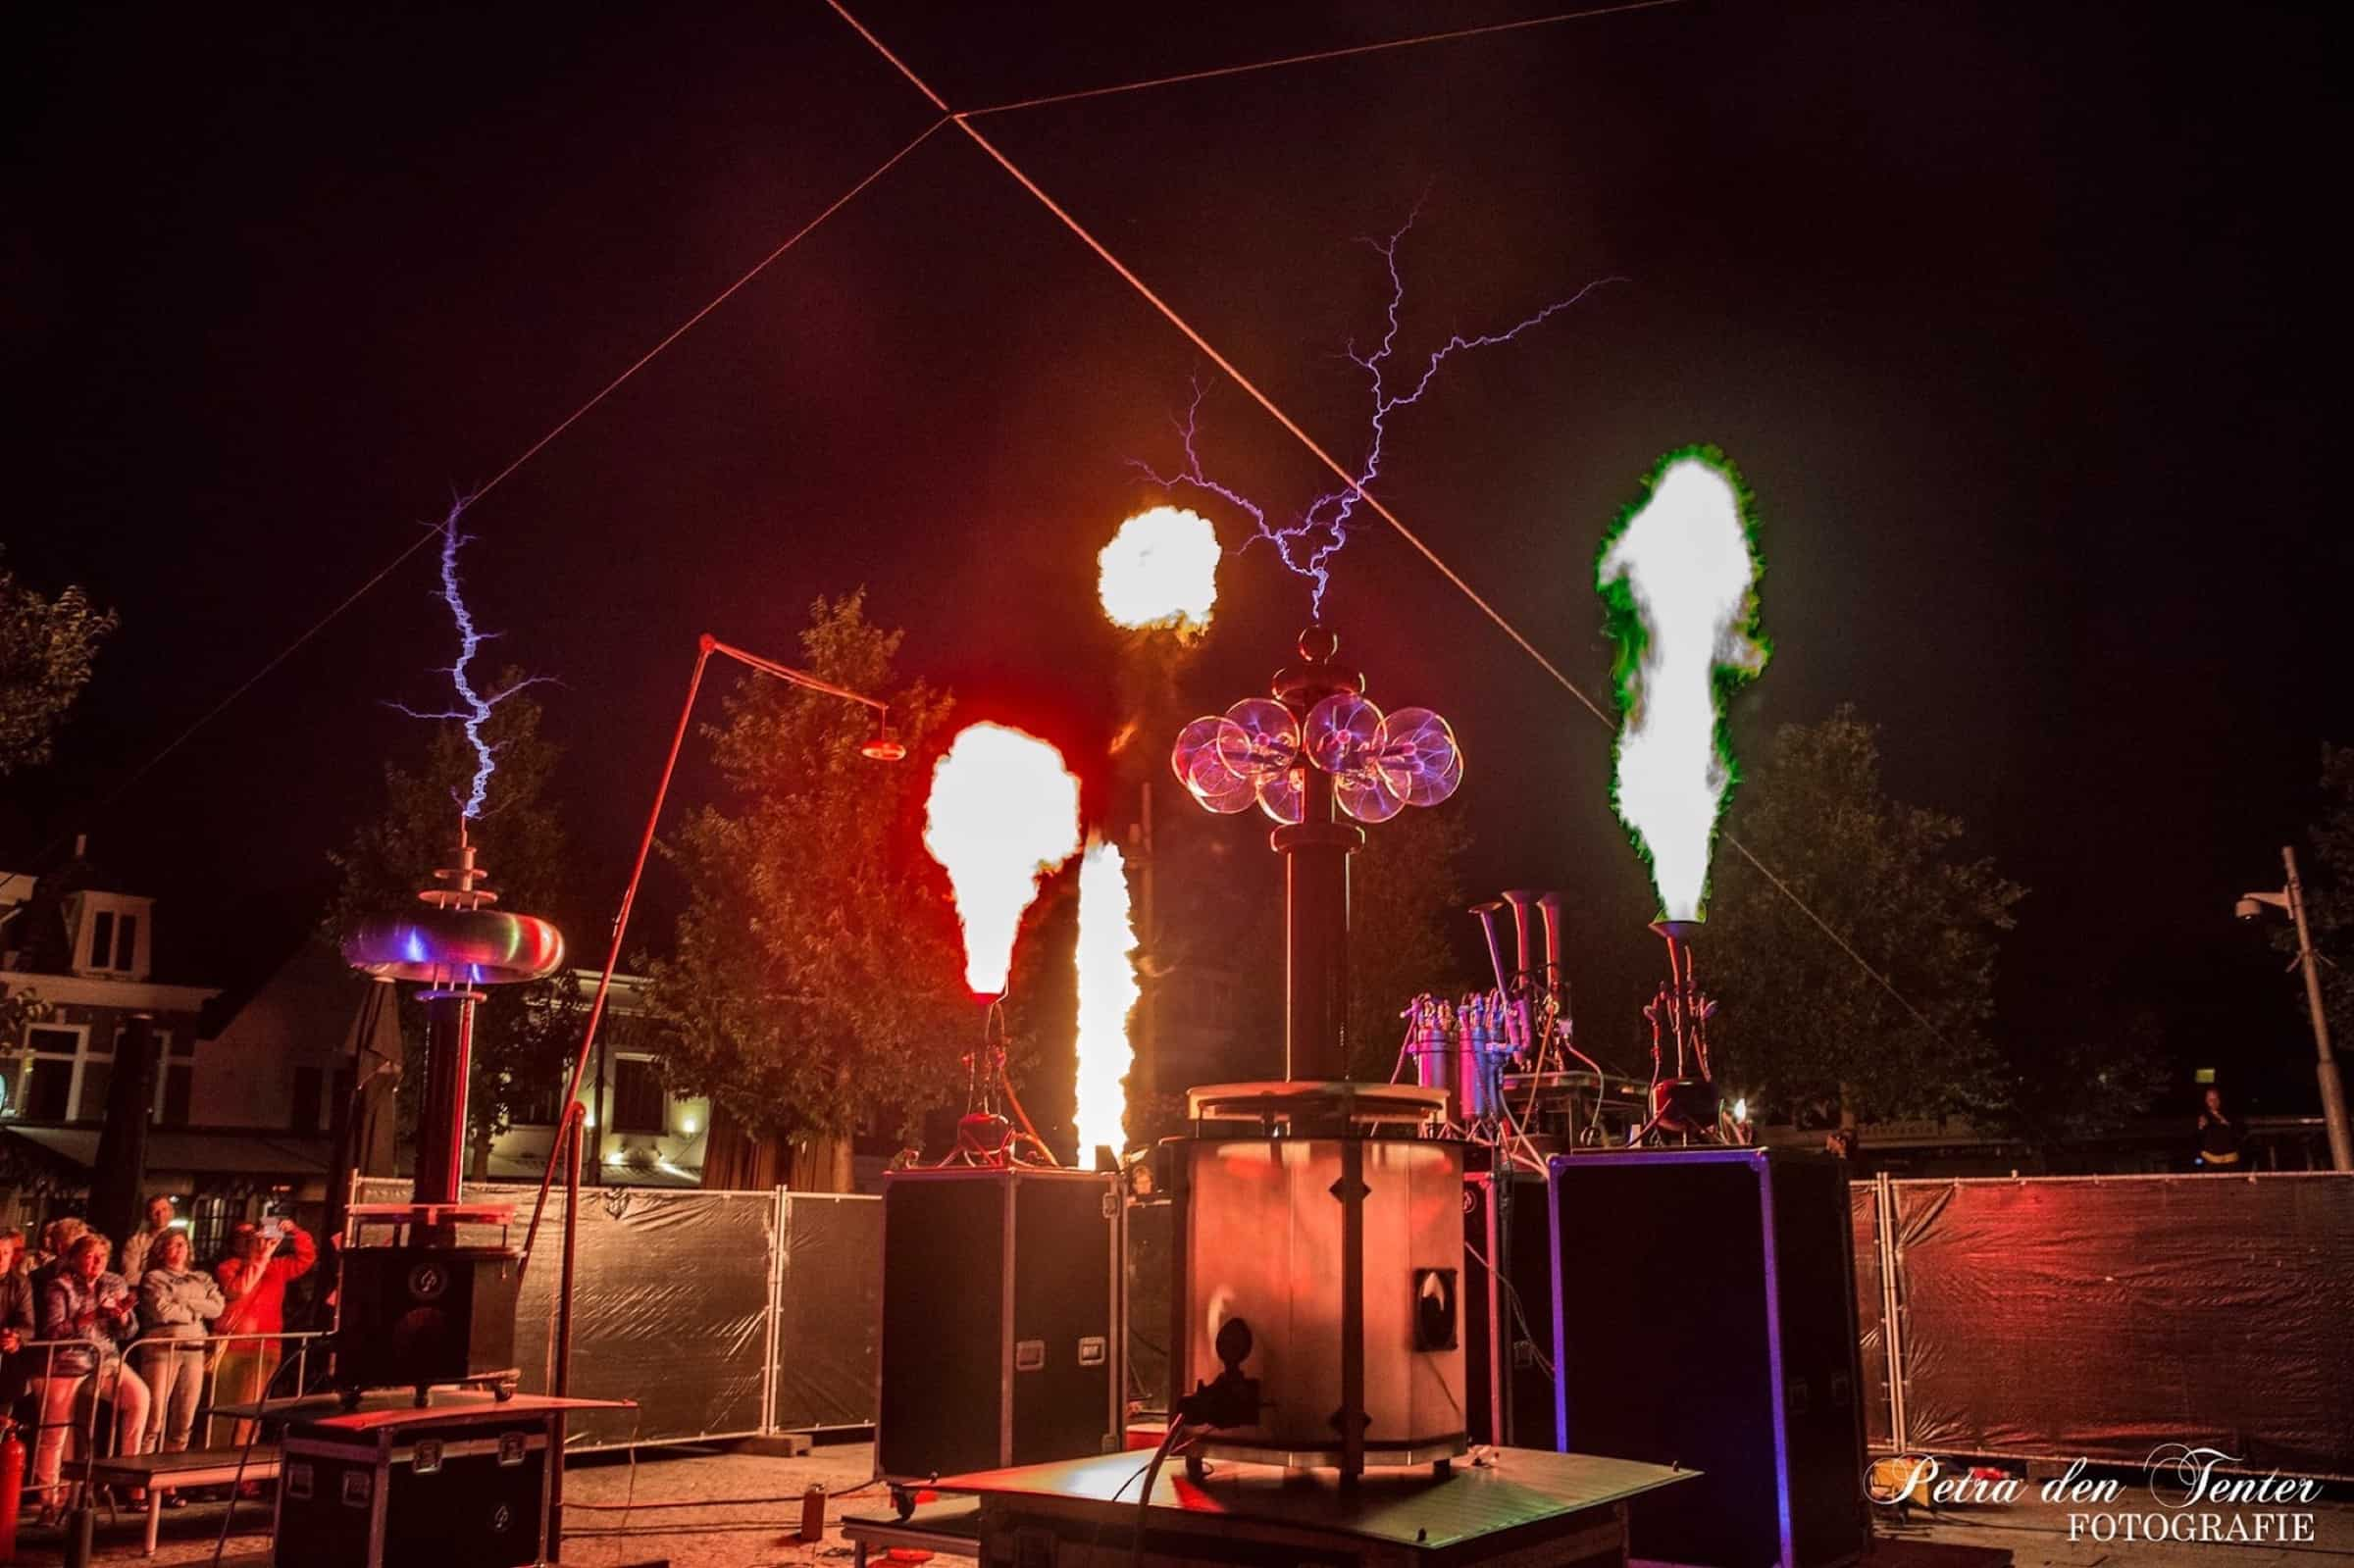 reuring foto The Symphony of Fire - gespot - muziek - installatie - vuur - bliksem - melodie - kunst kopie